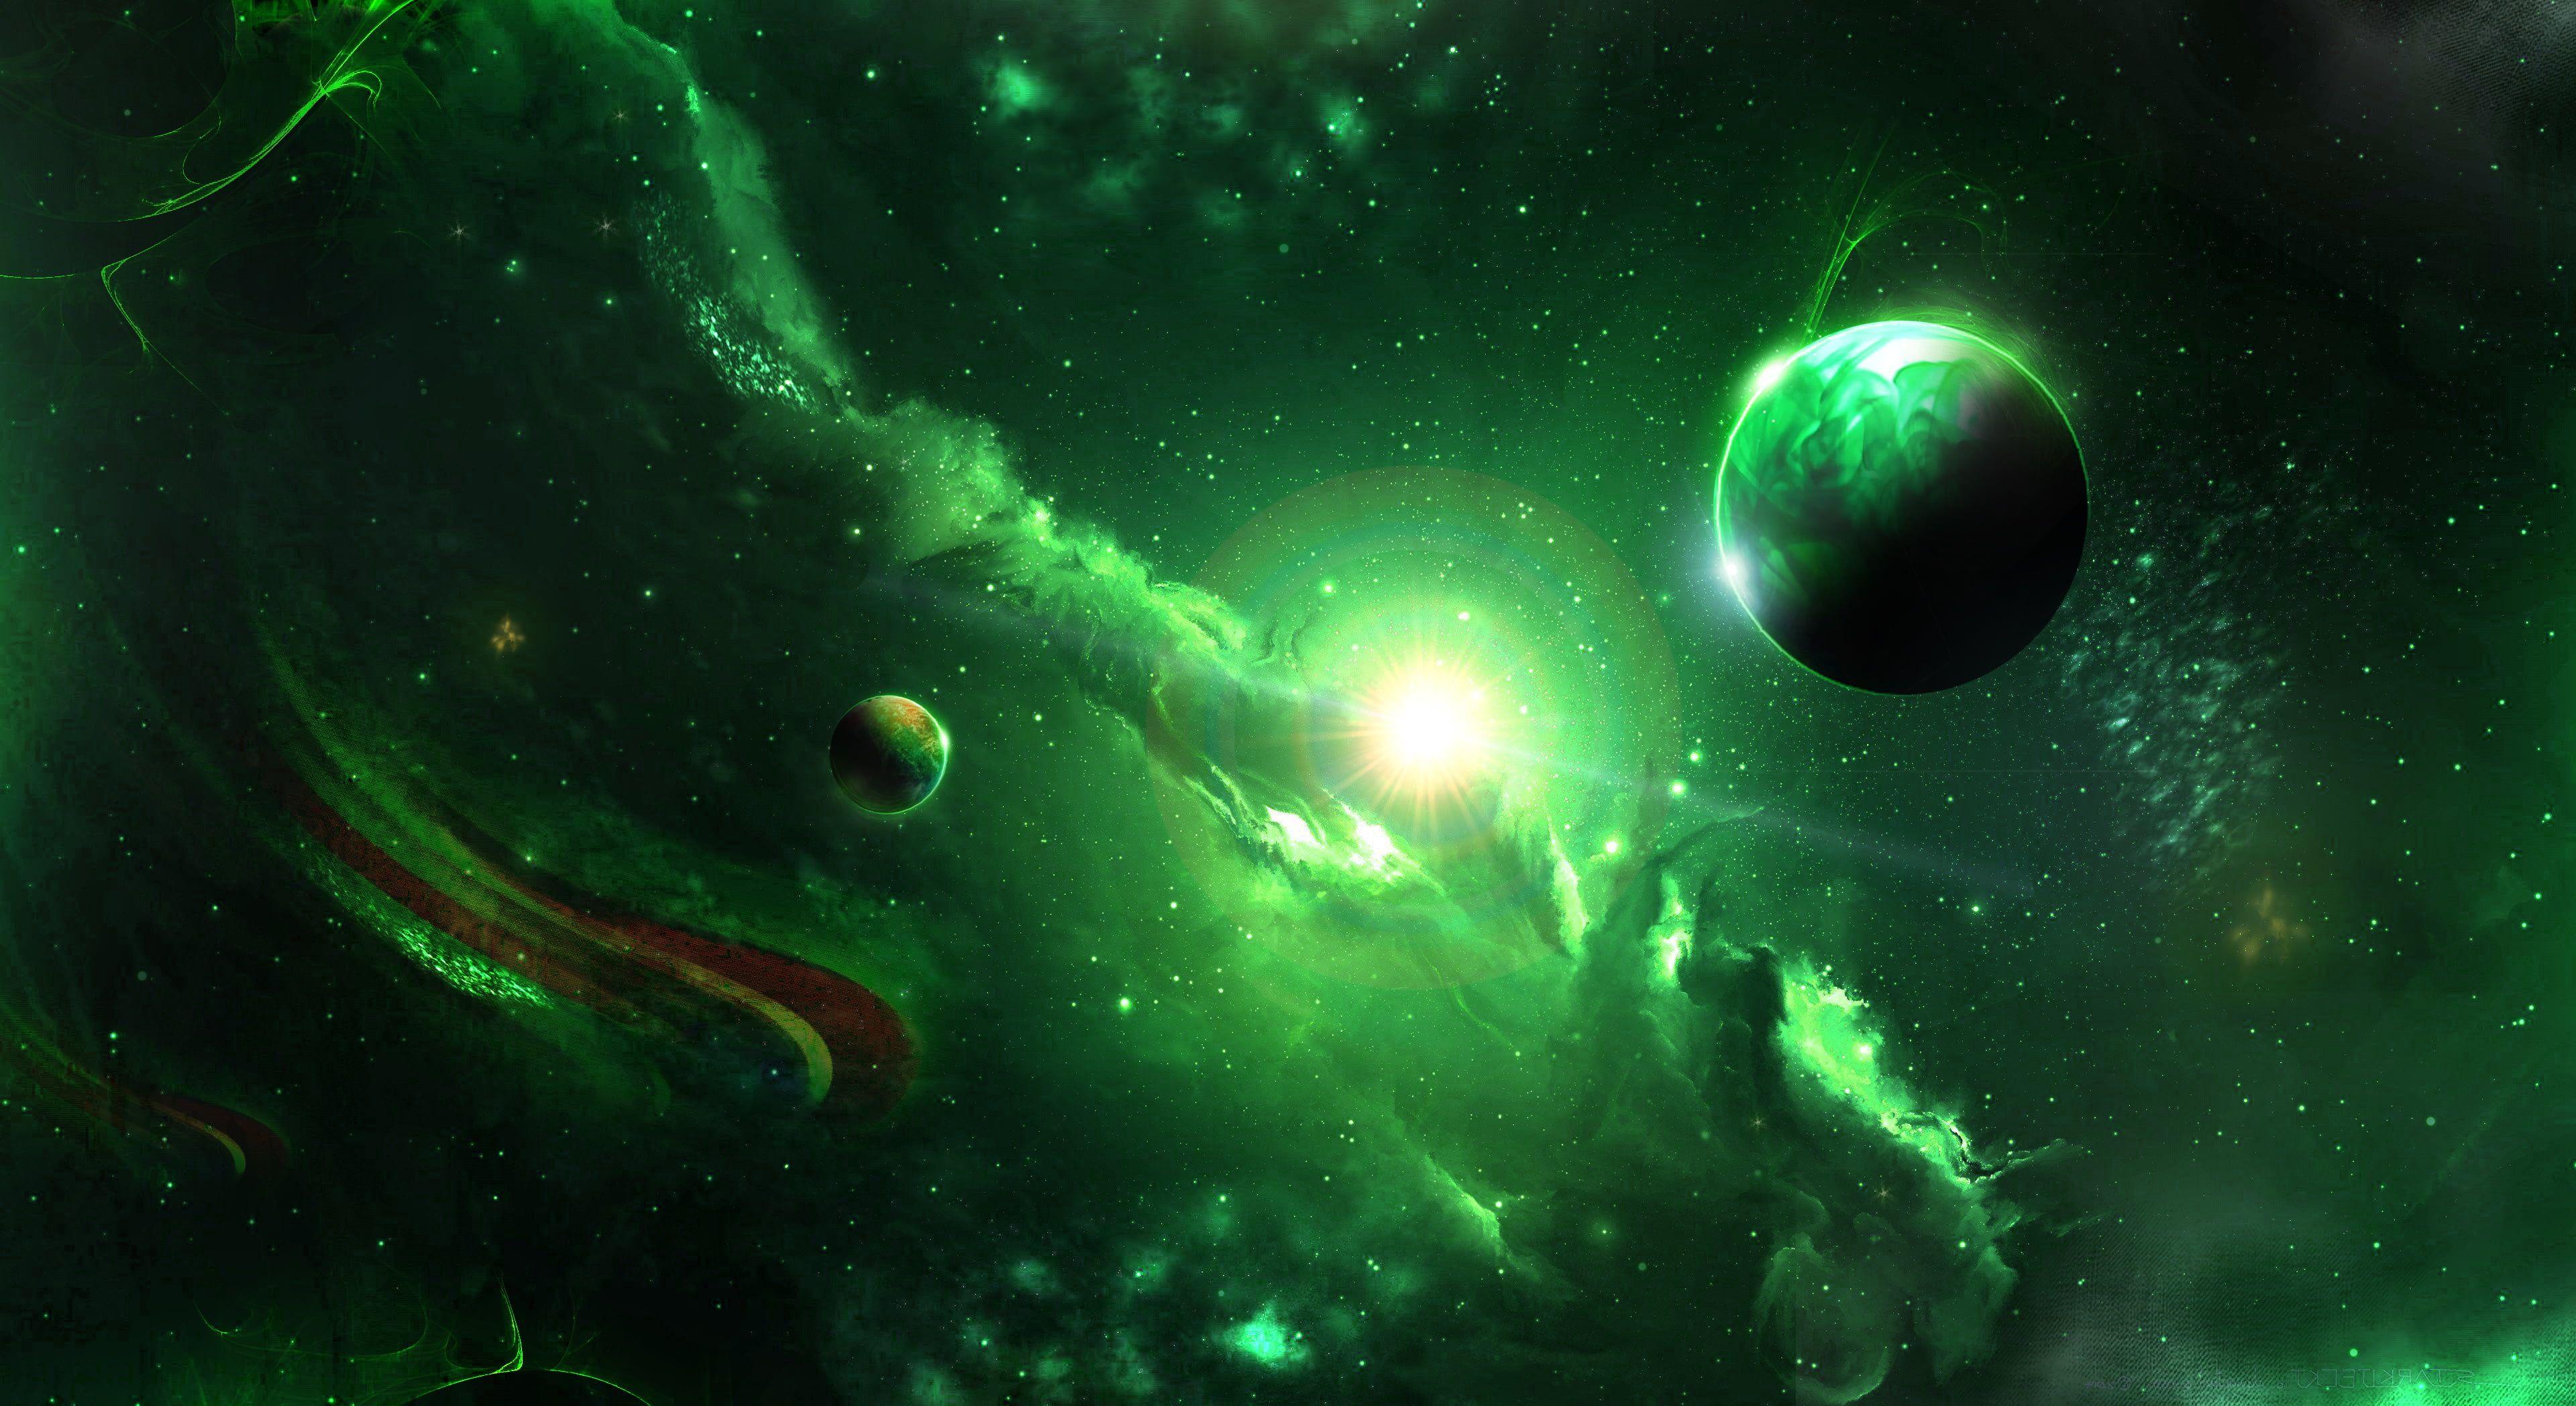 Sci Fi Nebula Green Planet Space 4k Wallpaper Hdwallpaper Desktop Nebula Wallpaper Astronaut Wallpaper Nebula